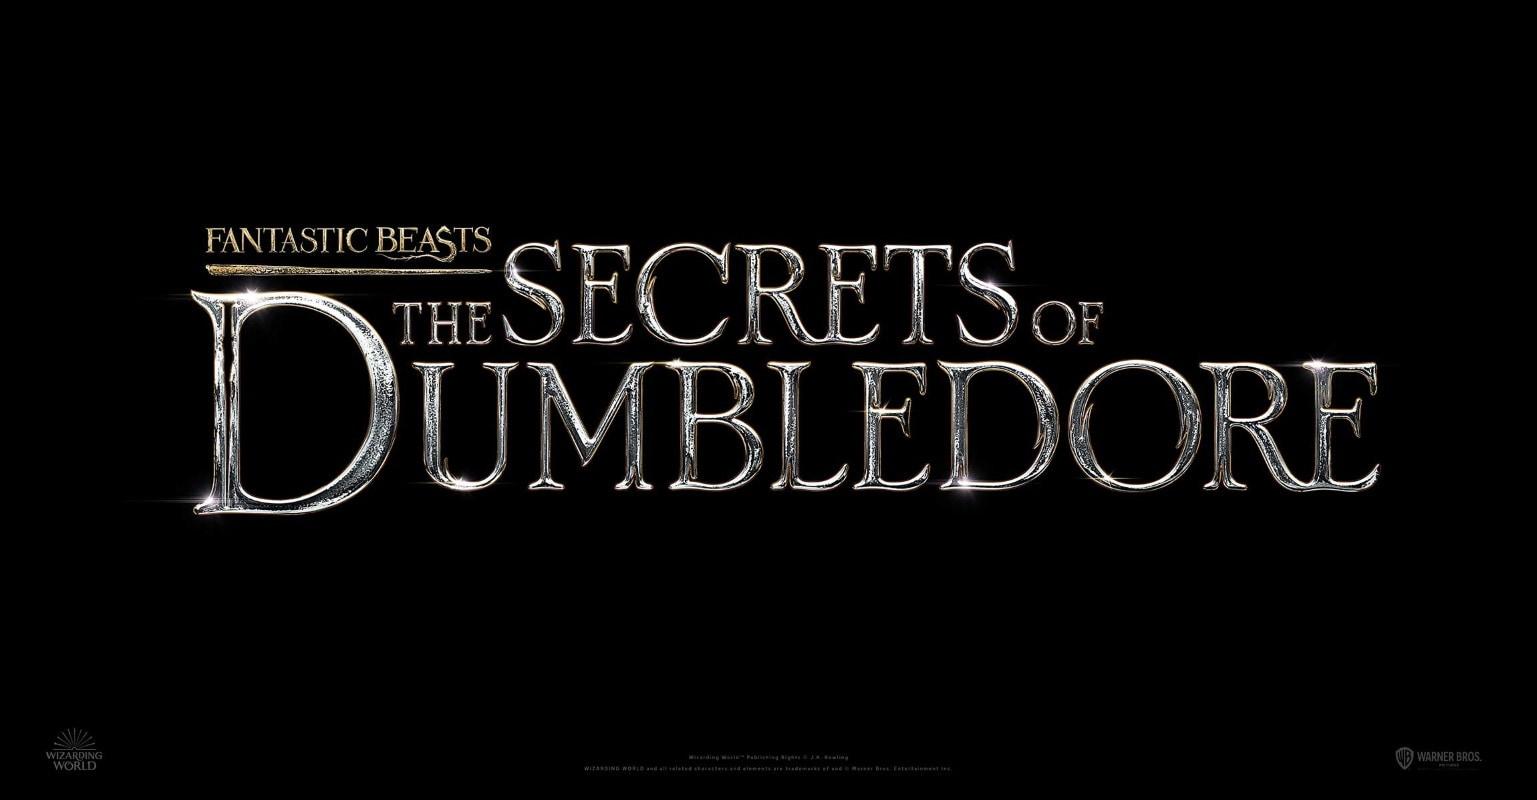 Fantastic-Beasts-The-Secrets-of-Dumbledore-Logo_small_1632375896718.jpg